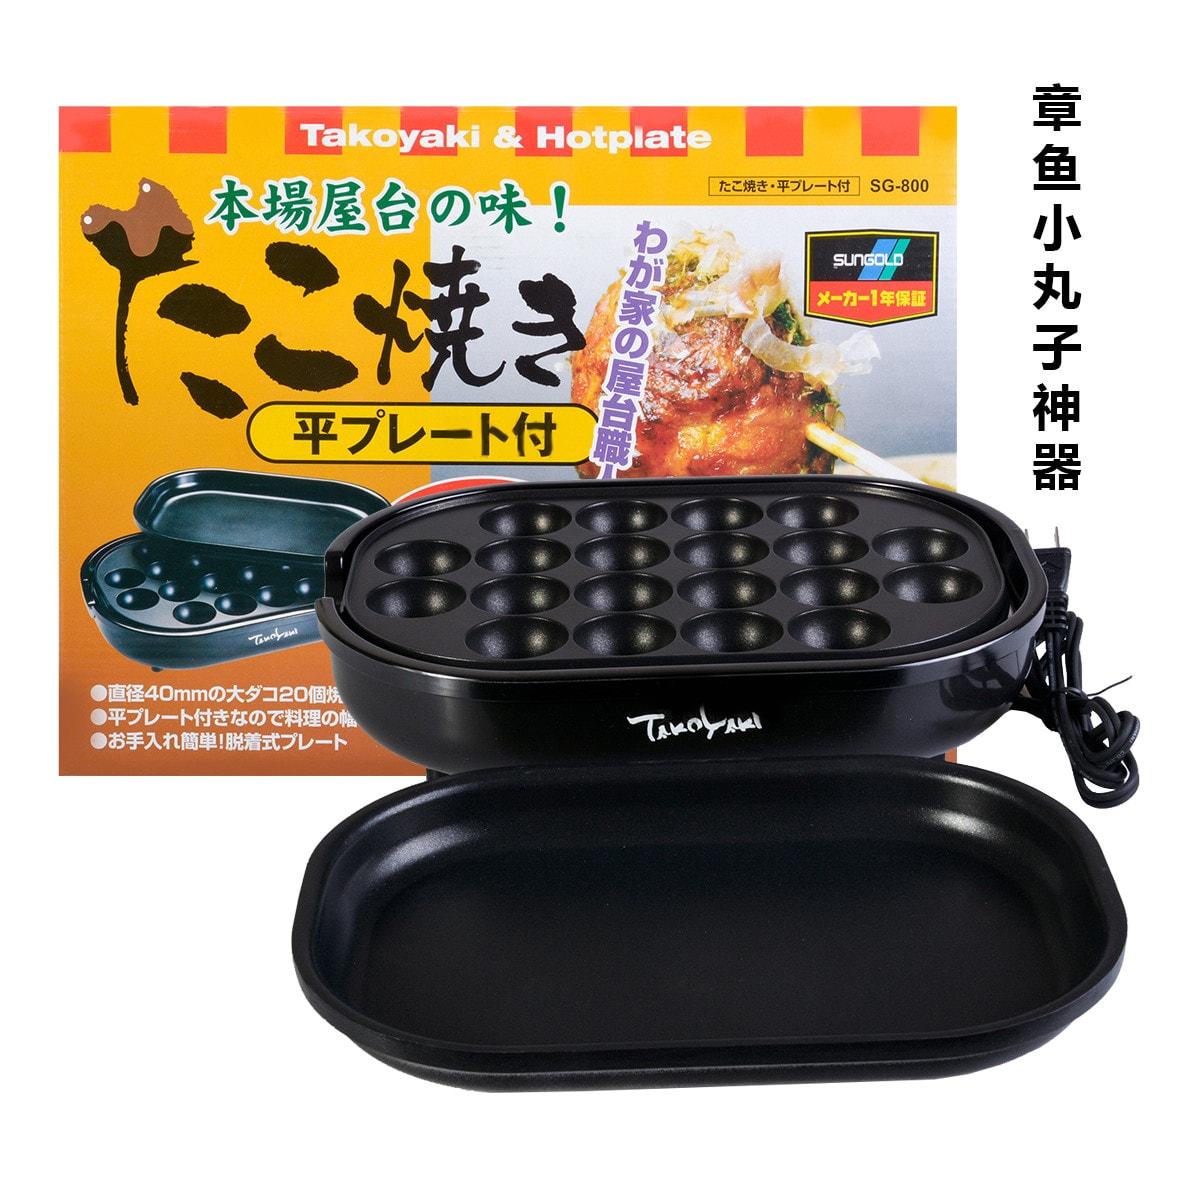 Yamibuy.com:Customer reviews:SUNGOLD Multifunction Dual Layer Takoyaki and Hotplate Maker SG-800